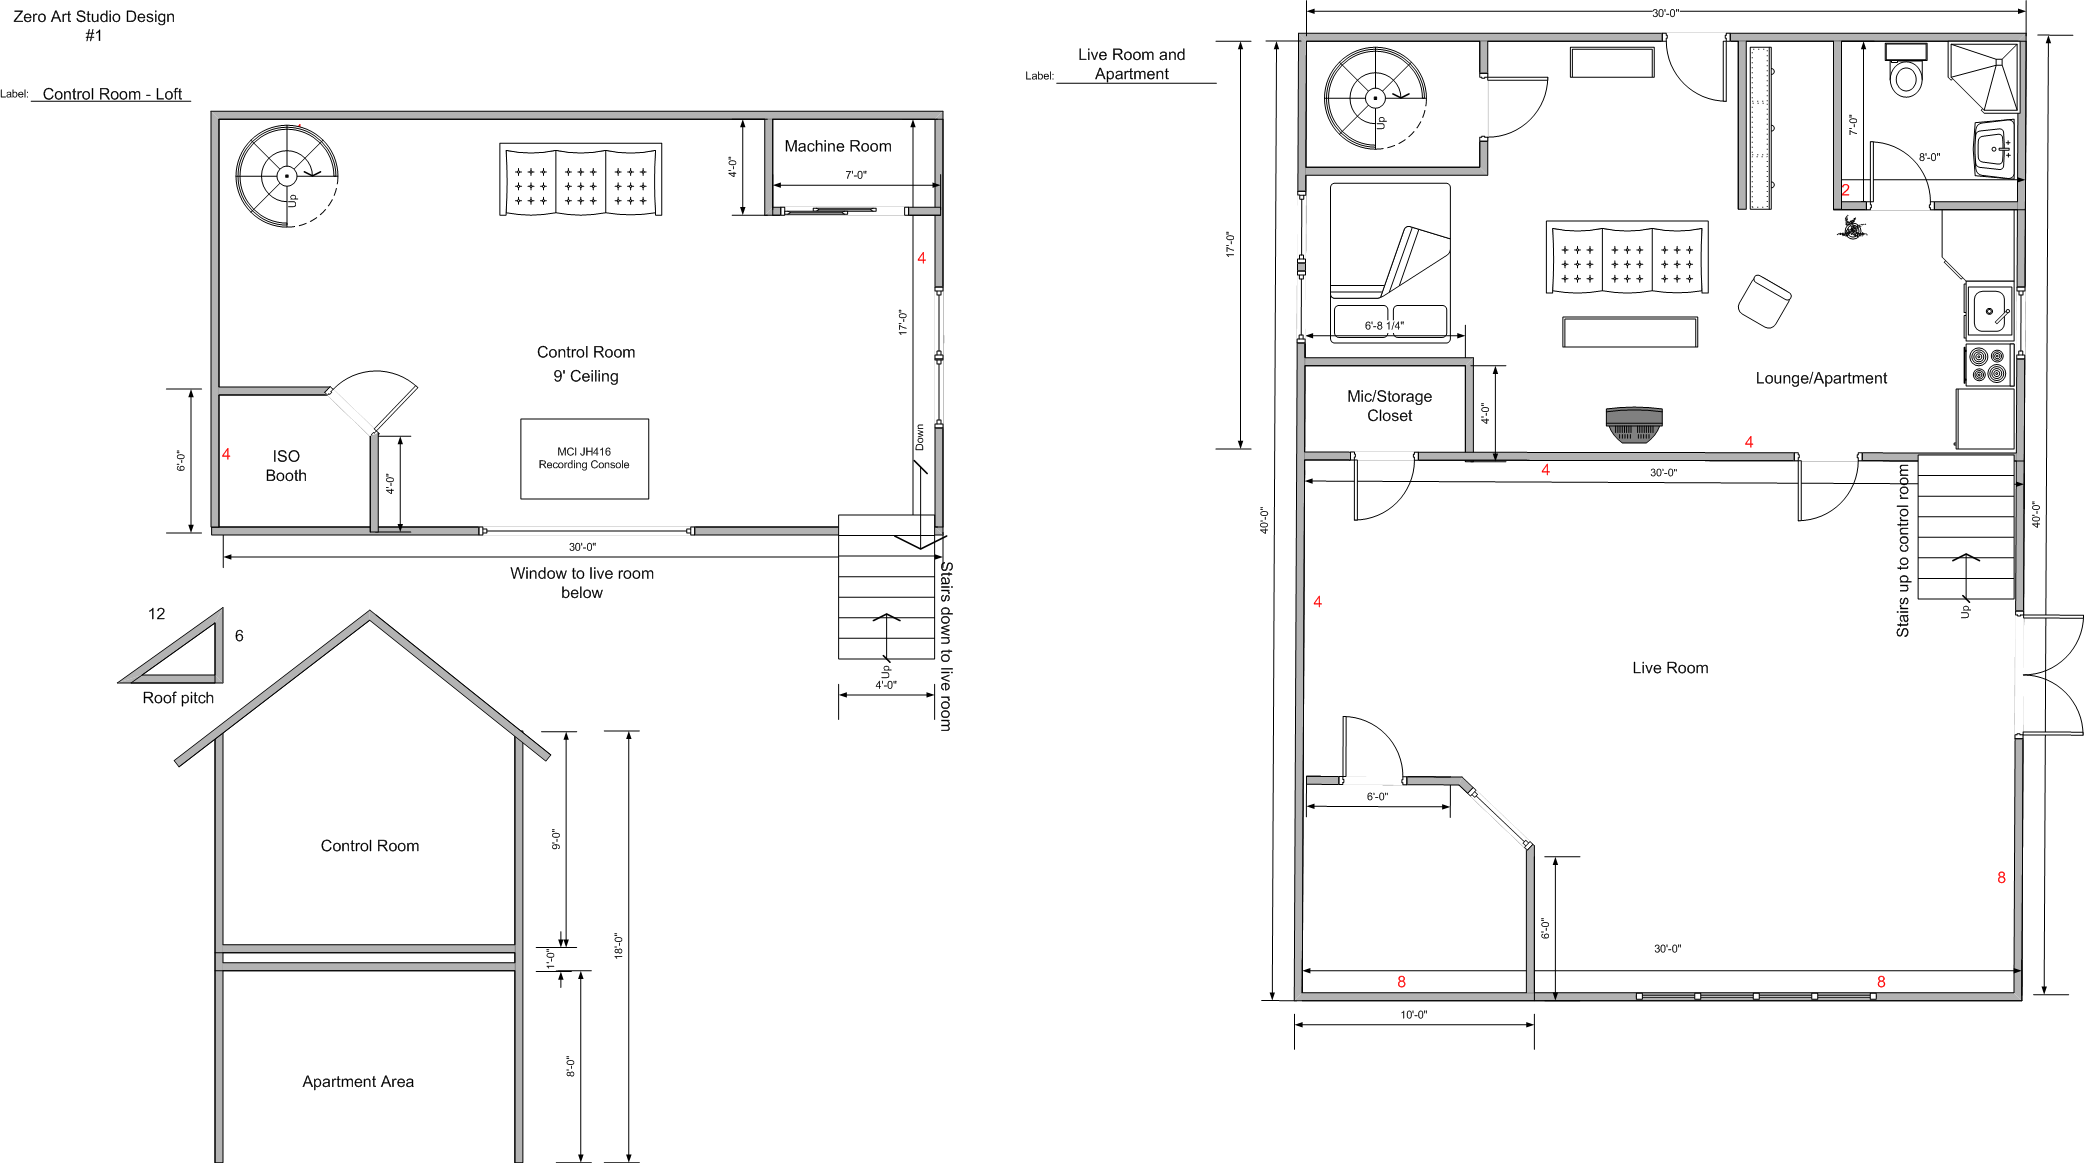 Zero Art Studio Final Floor Plan Tate Eskew